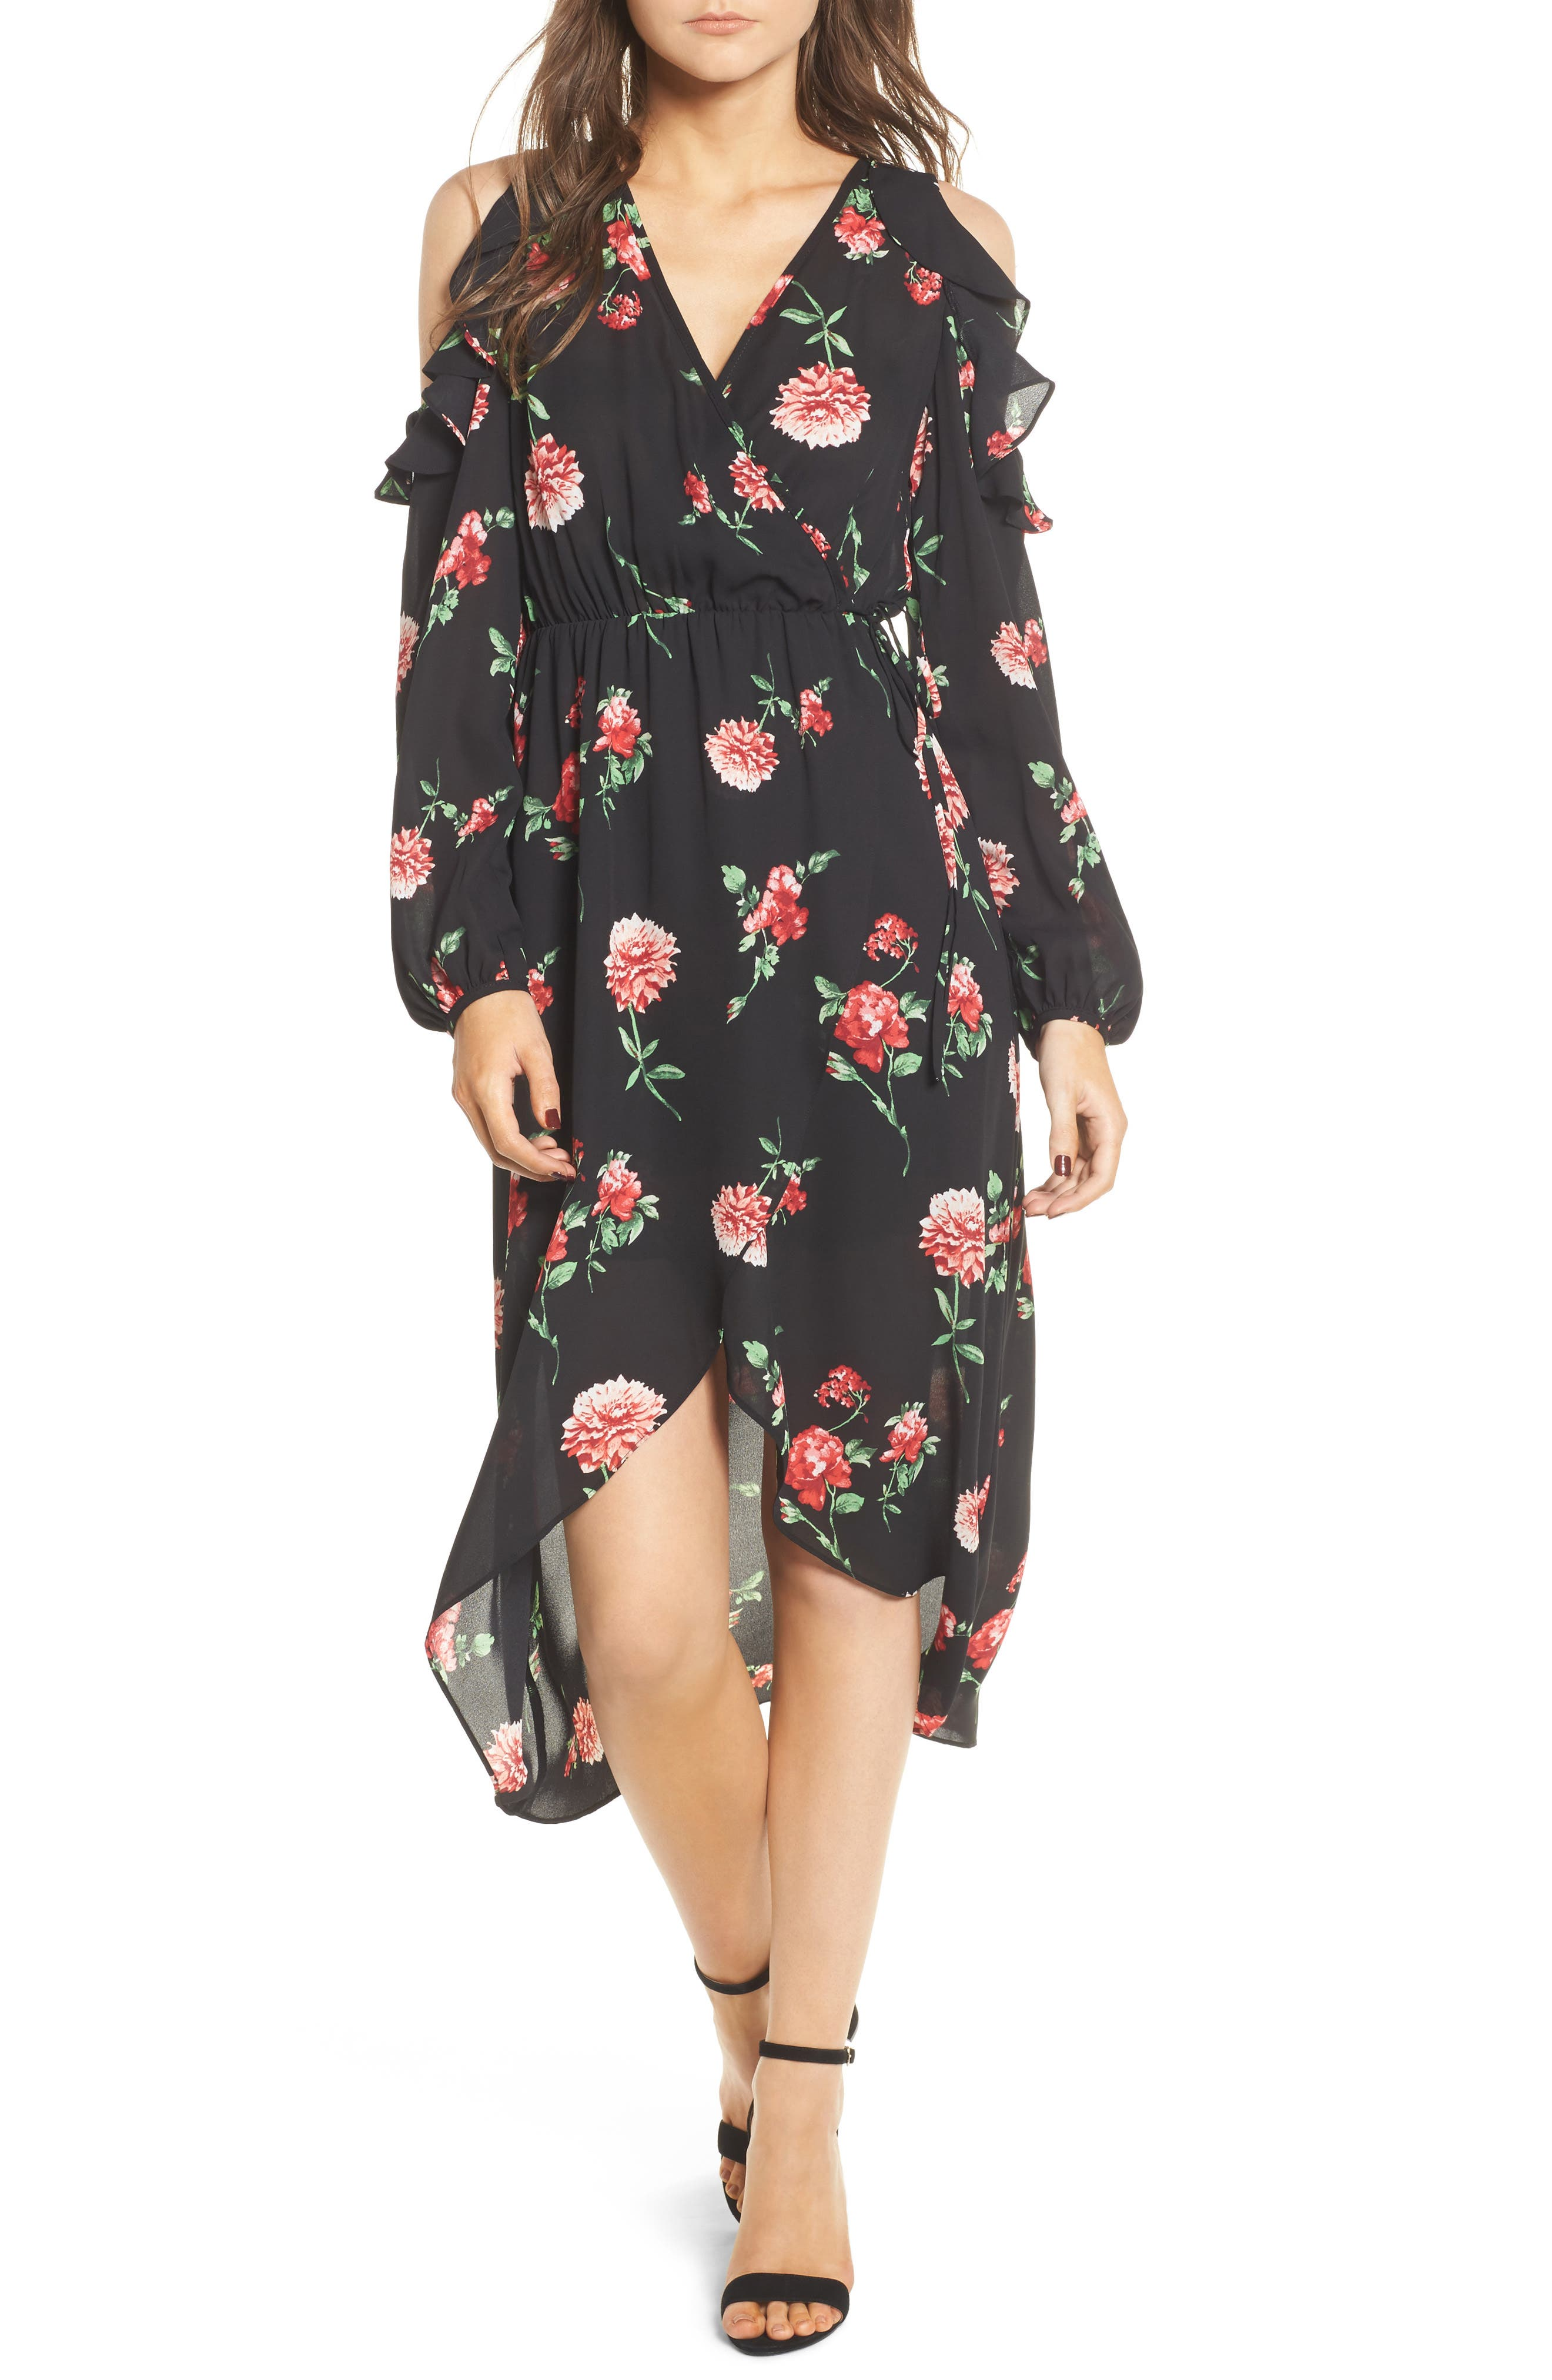 Ruffle Cold Shoulder Faux Wrap Dress,                         Main,                         color, 750 Black Red